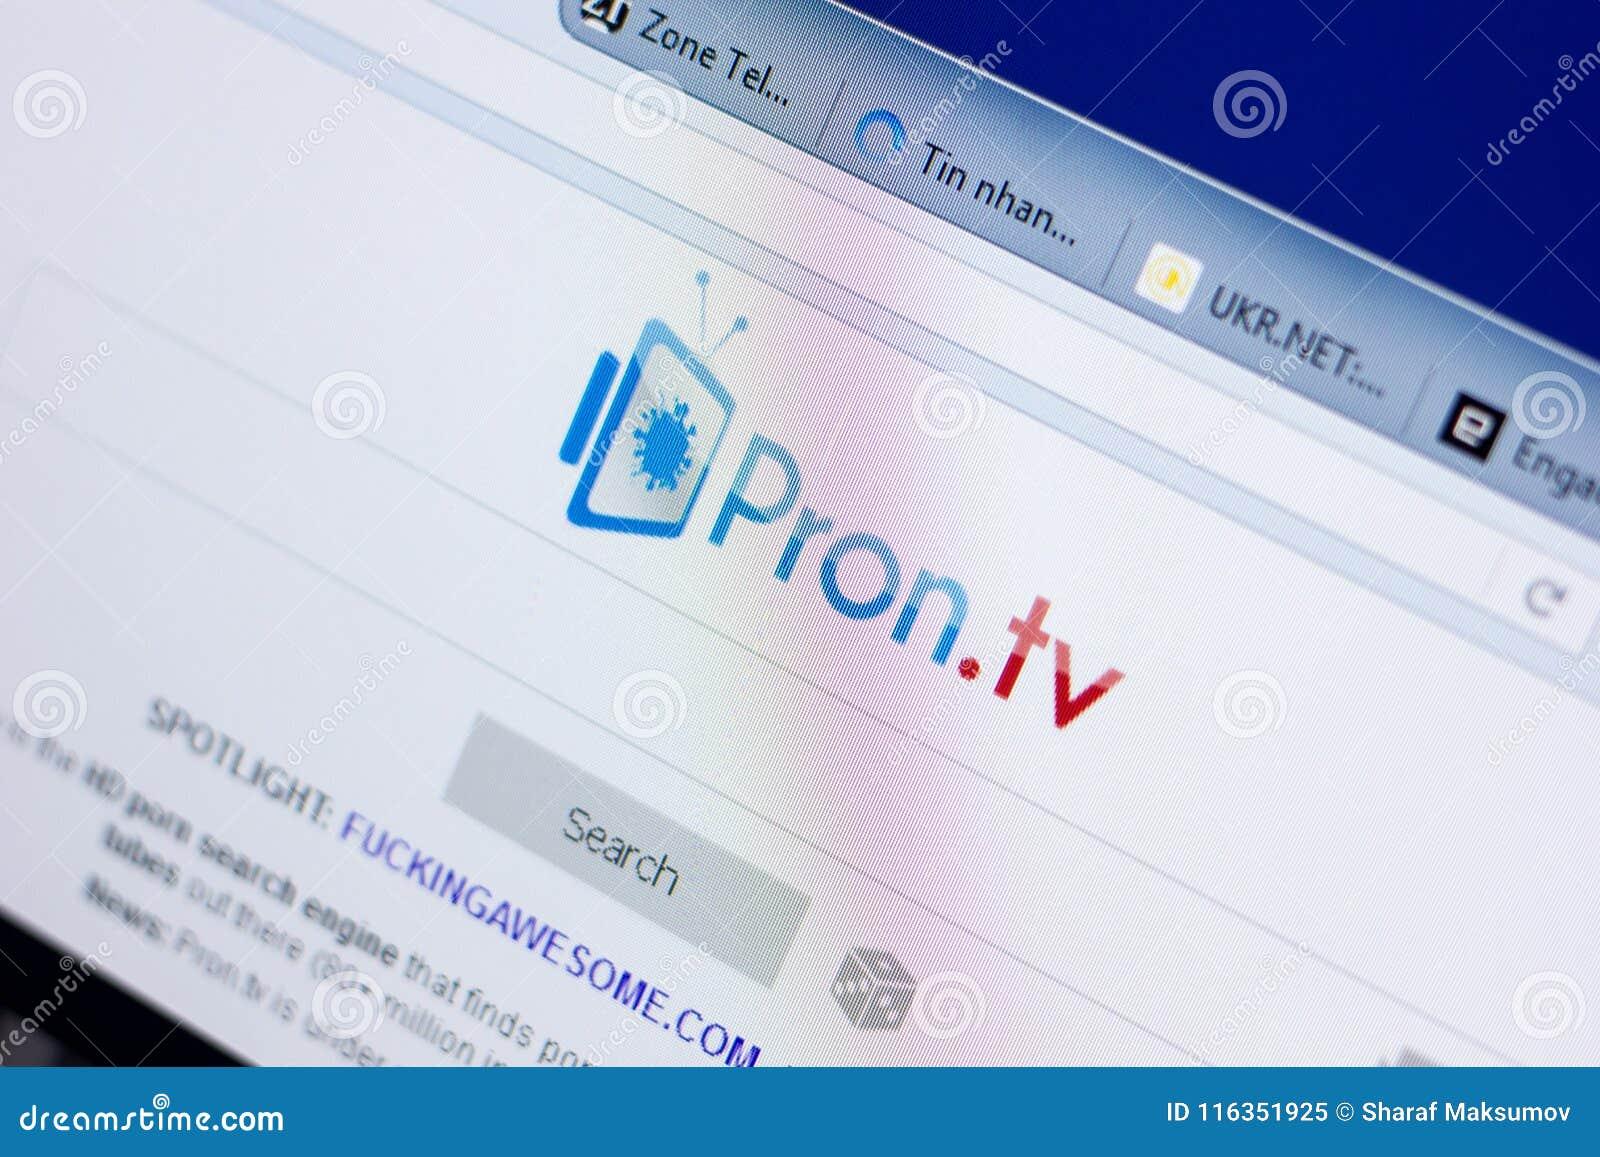 Ryazan Russia May 08 2018 Pron Website On The Display Of Pc Url Pron Tv